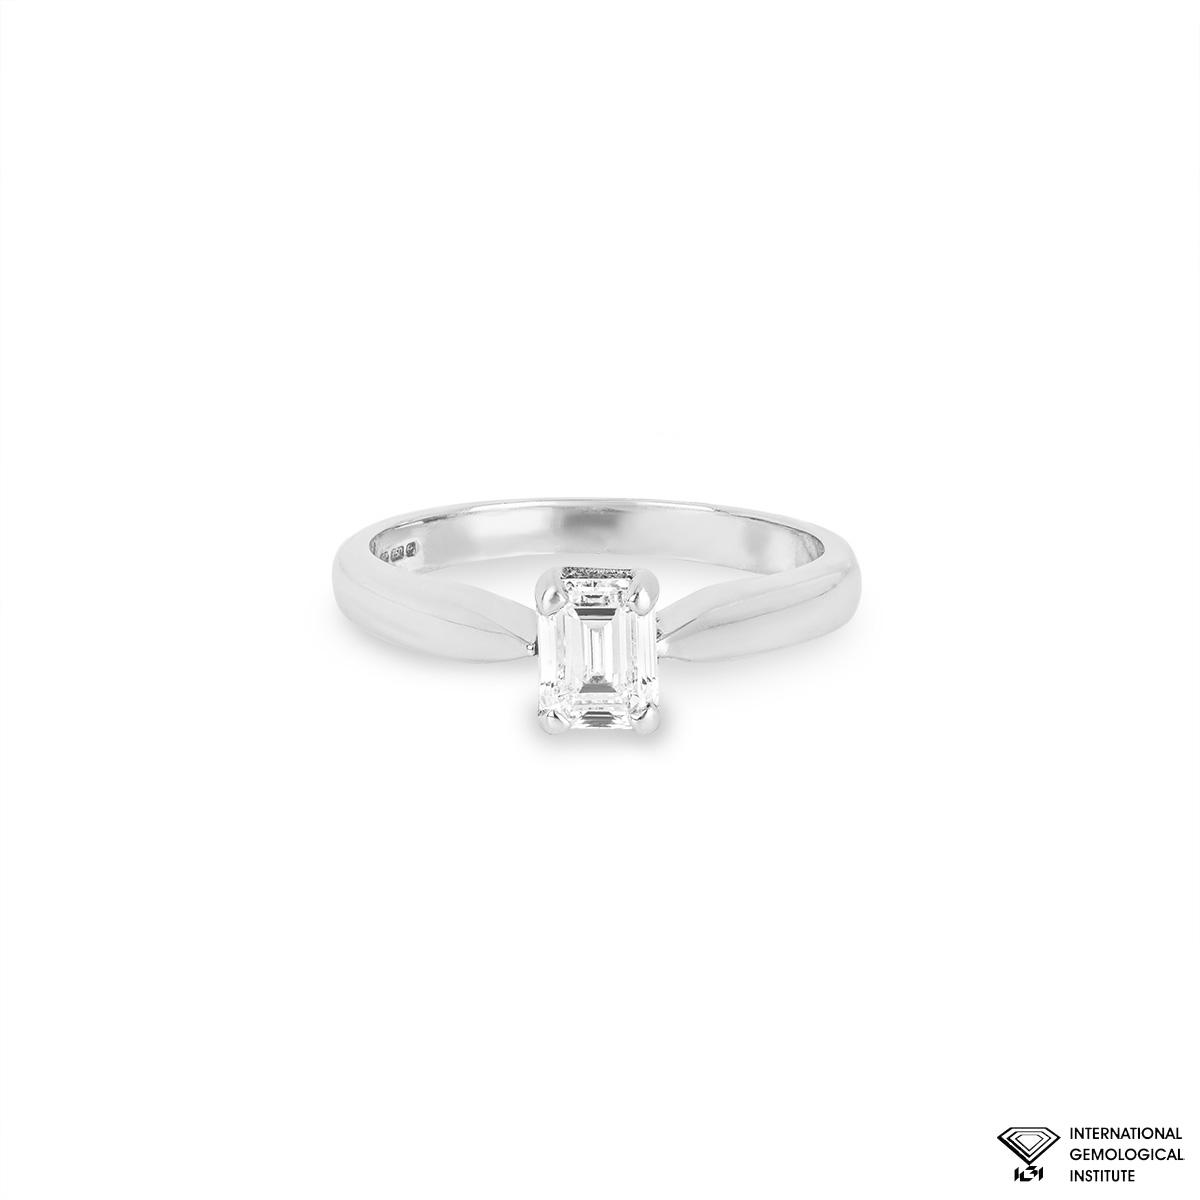 18WG 0.73ct Emerald Cut Diamond Single Stone Ring